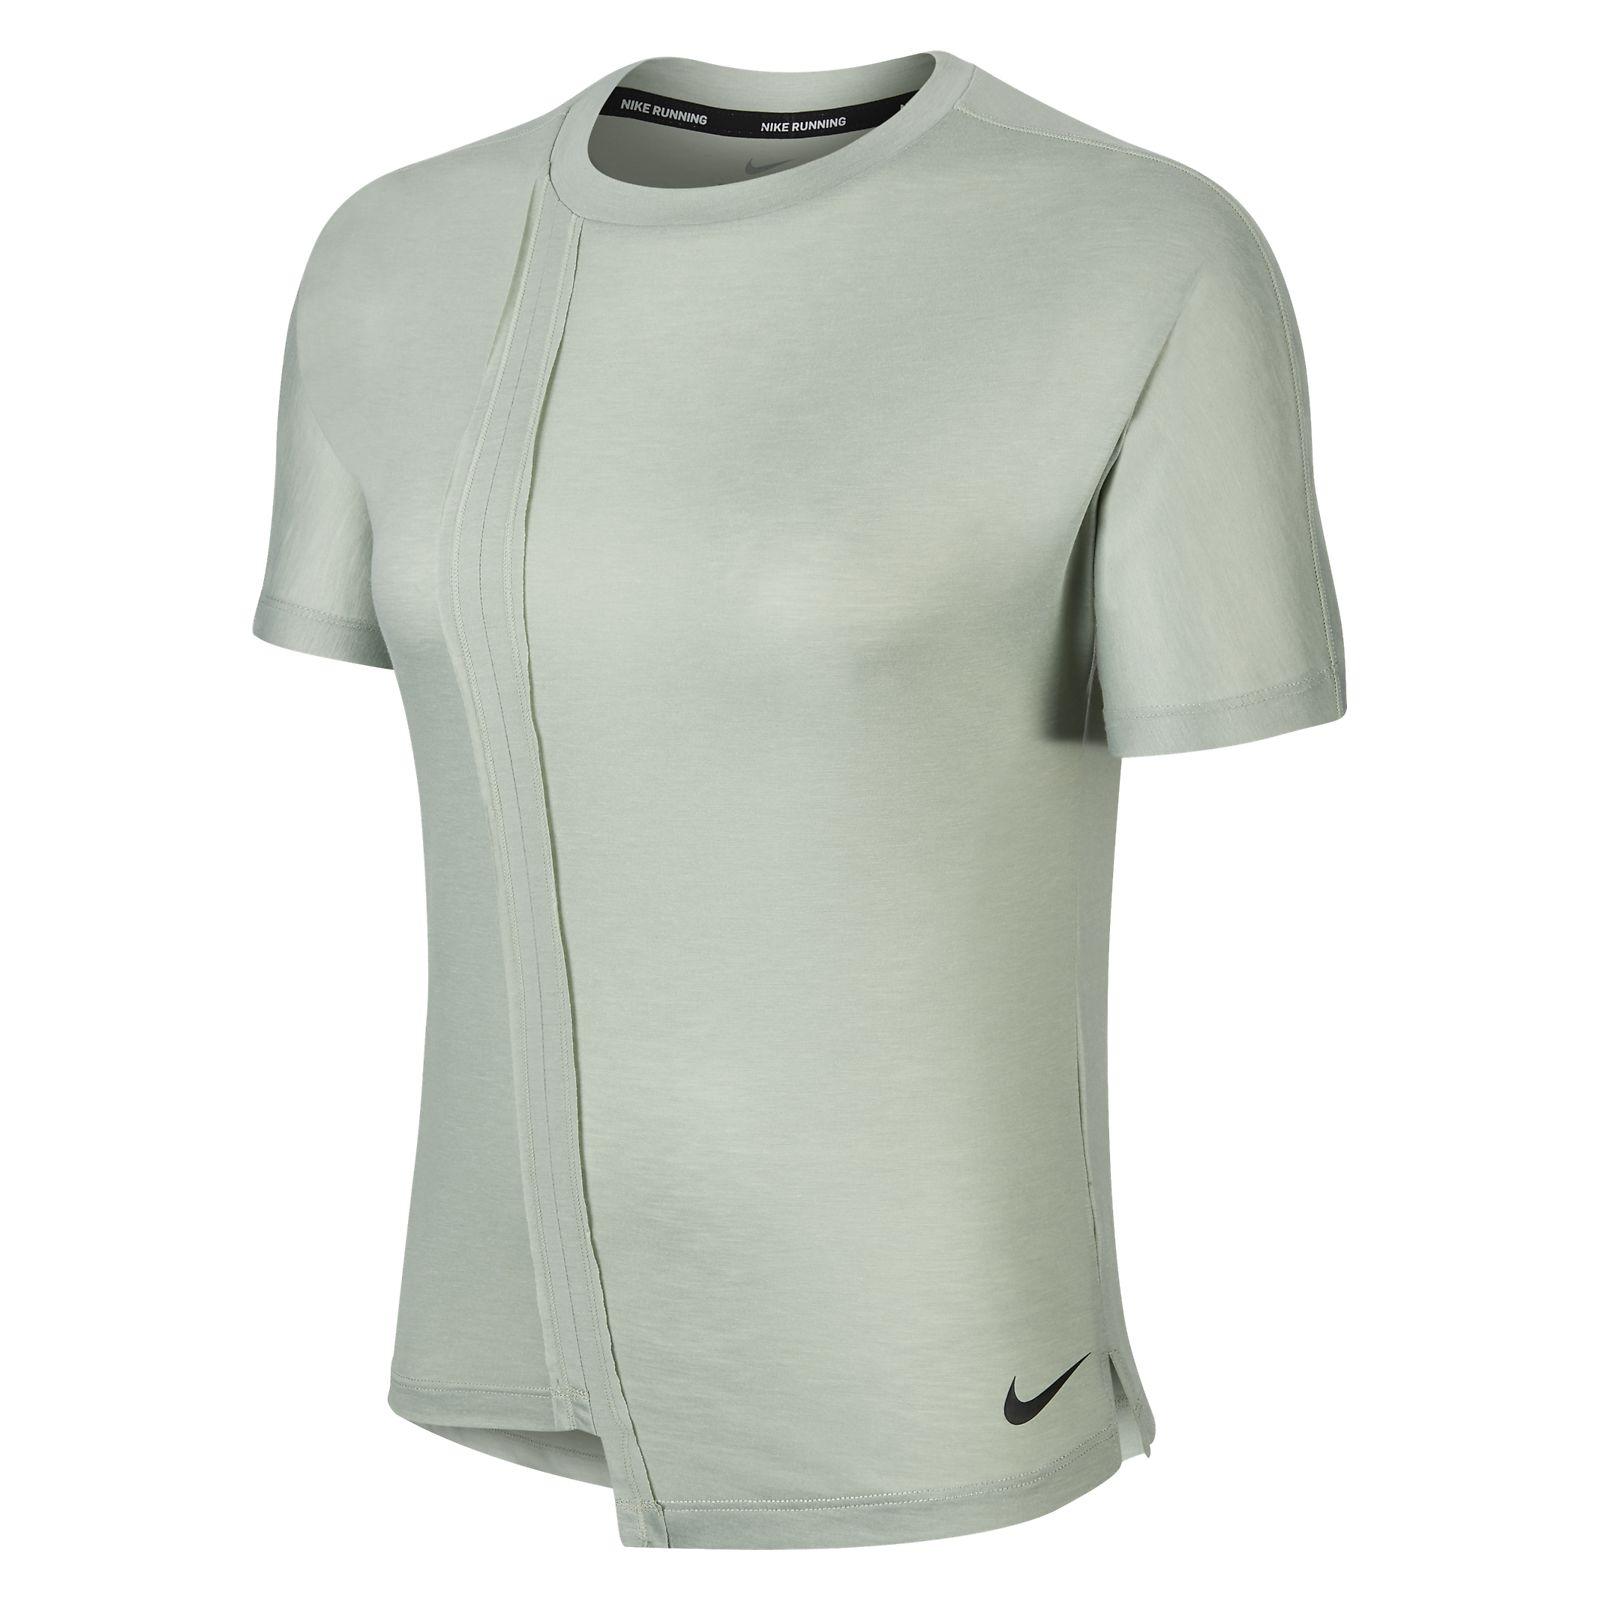 Koszulka damska do biegania Nike BV3167